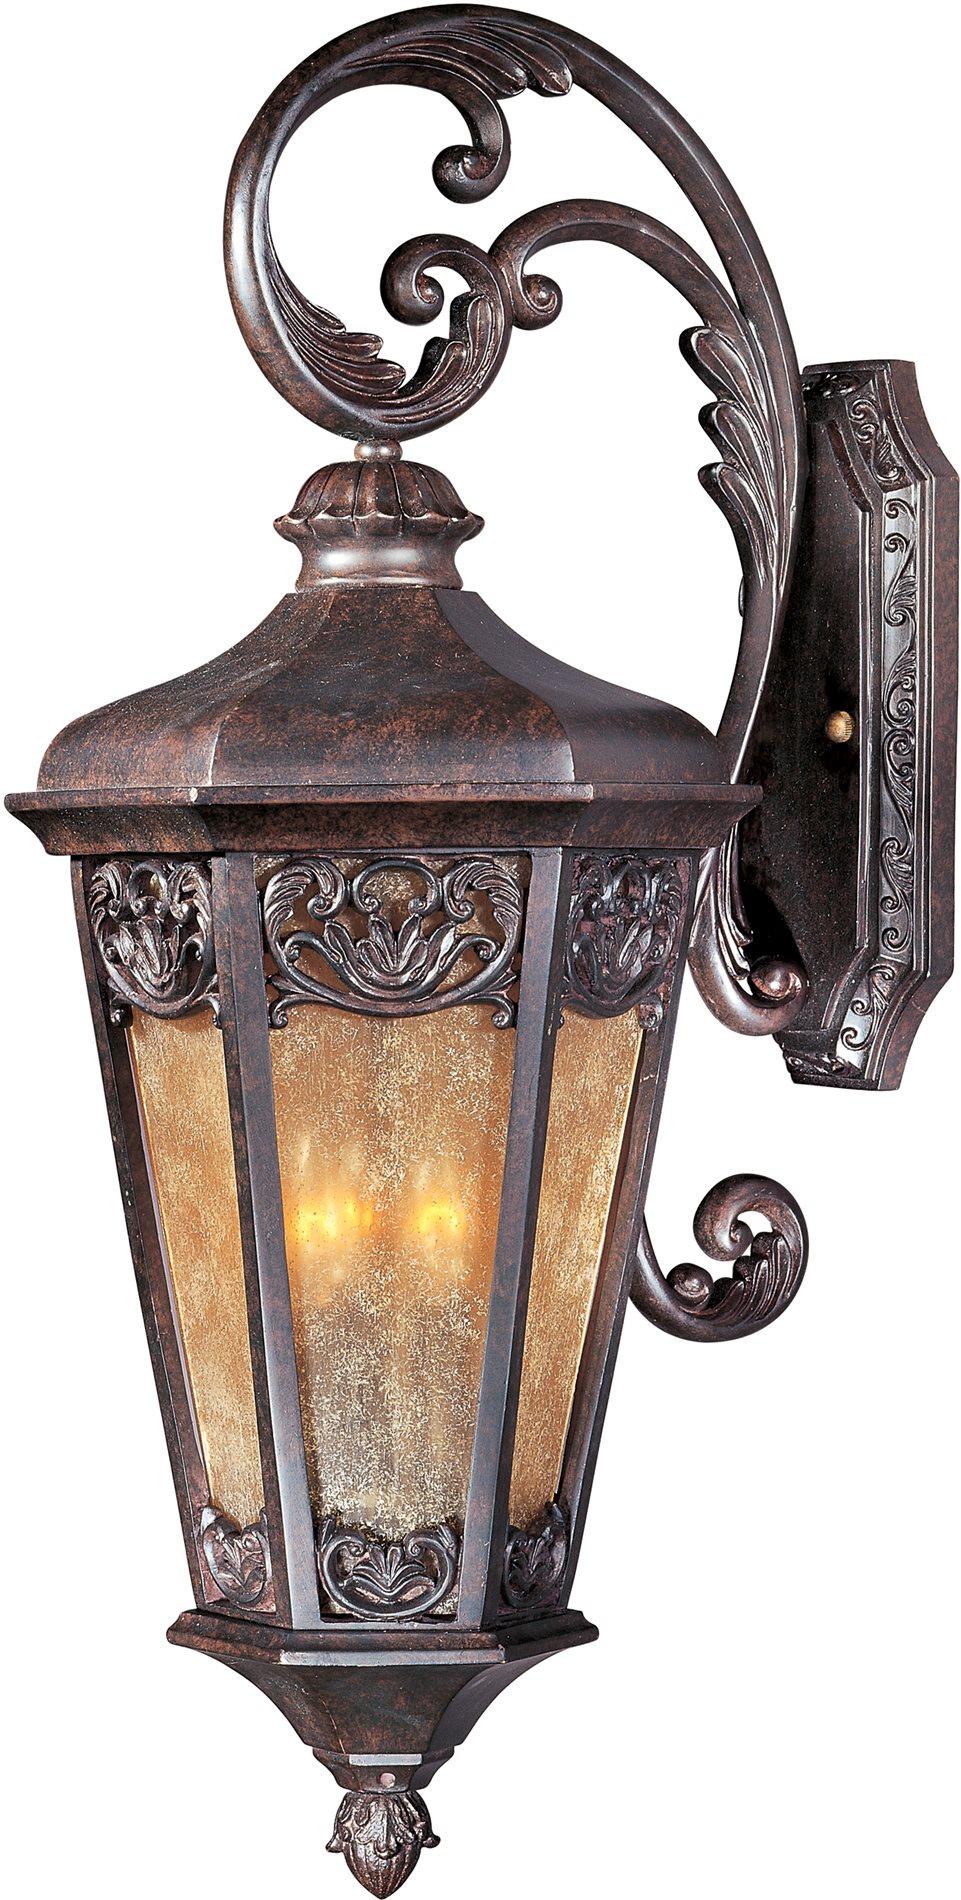 Maxim Lighting 40174nscu Lexington Vx Traditional 3 Light Outdoor Wall Sconce Mx 40174 Ns Cu